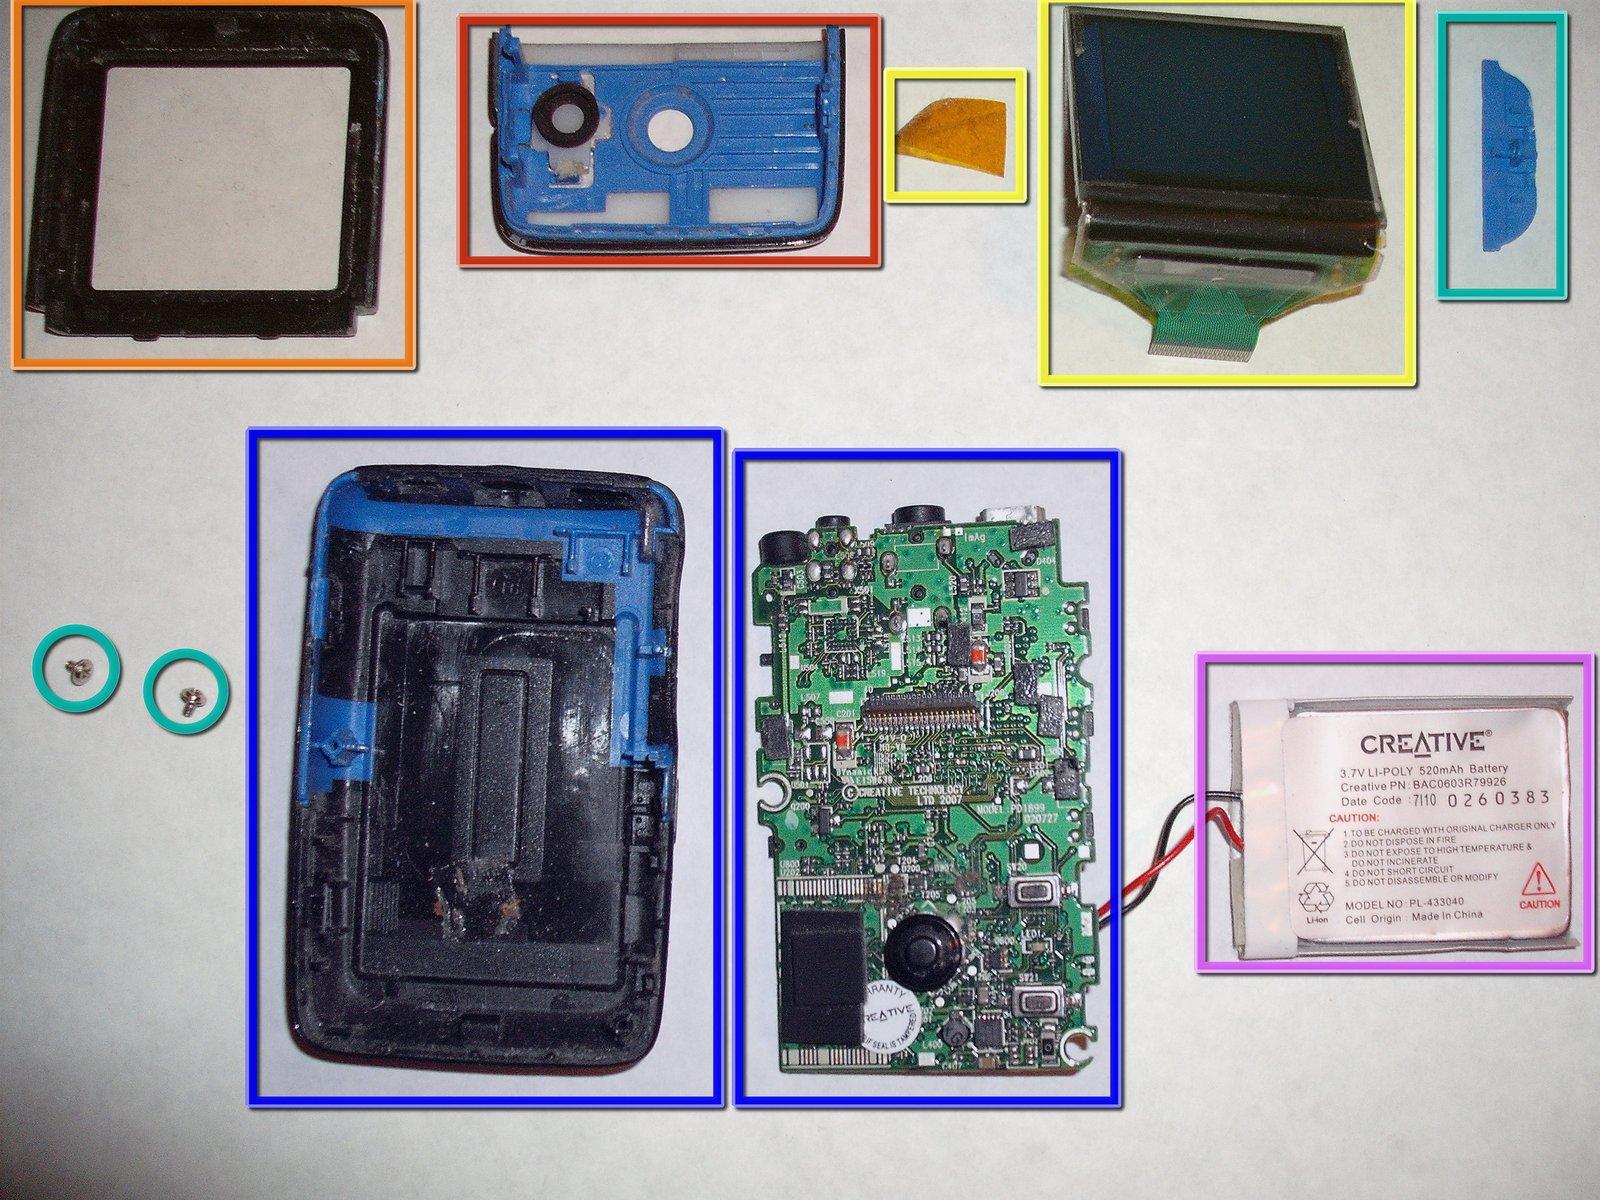 Zen V Creative Media Player Teardown Ifixit Short Circuit No Disassemble